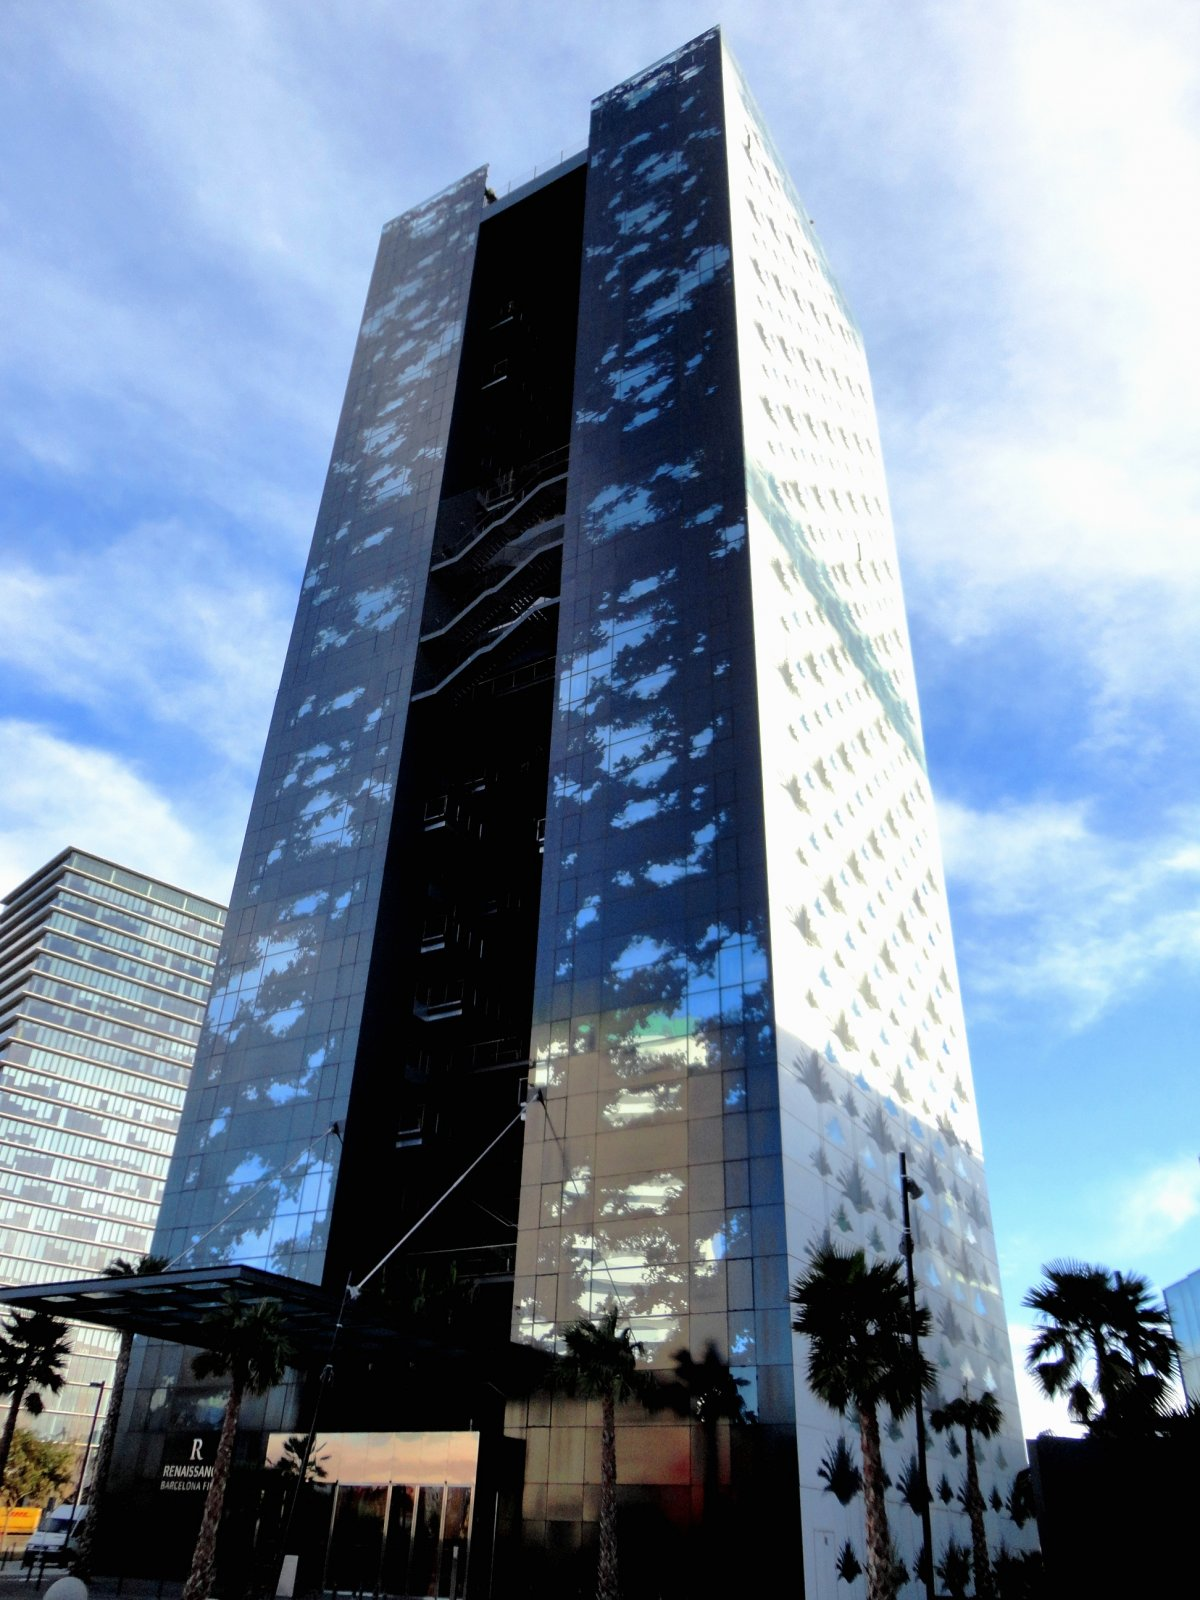 Renaissance Fira Hotel, Каталония, Испания, лучший небоскреб